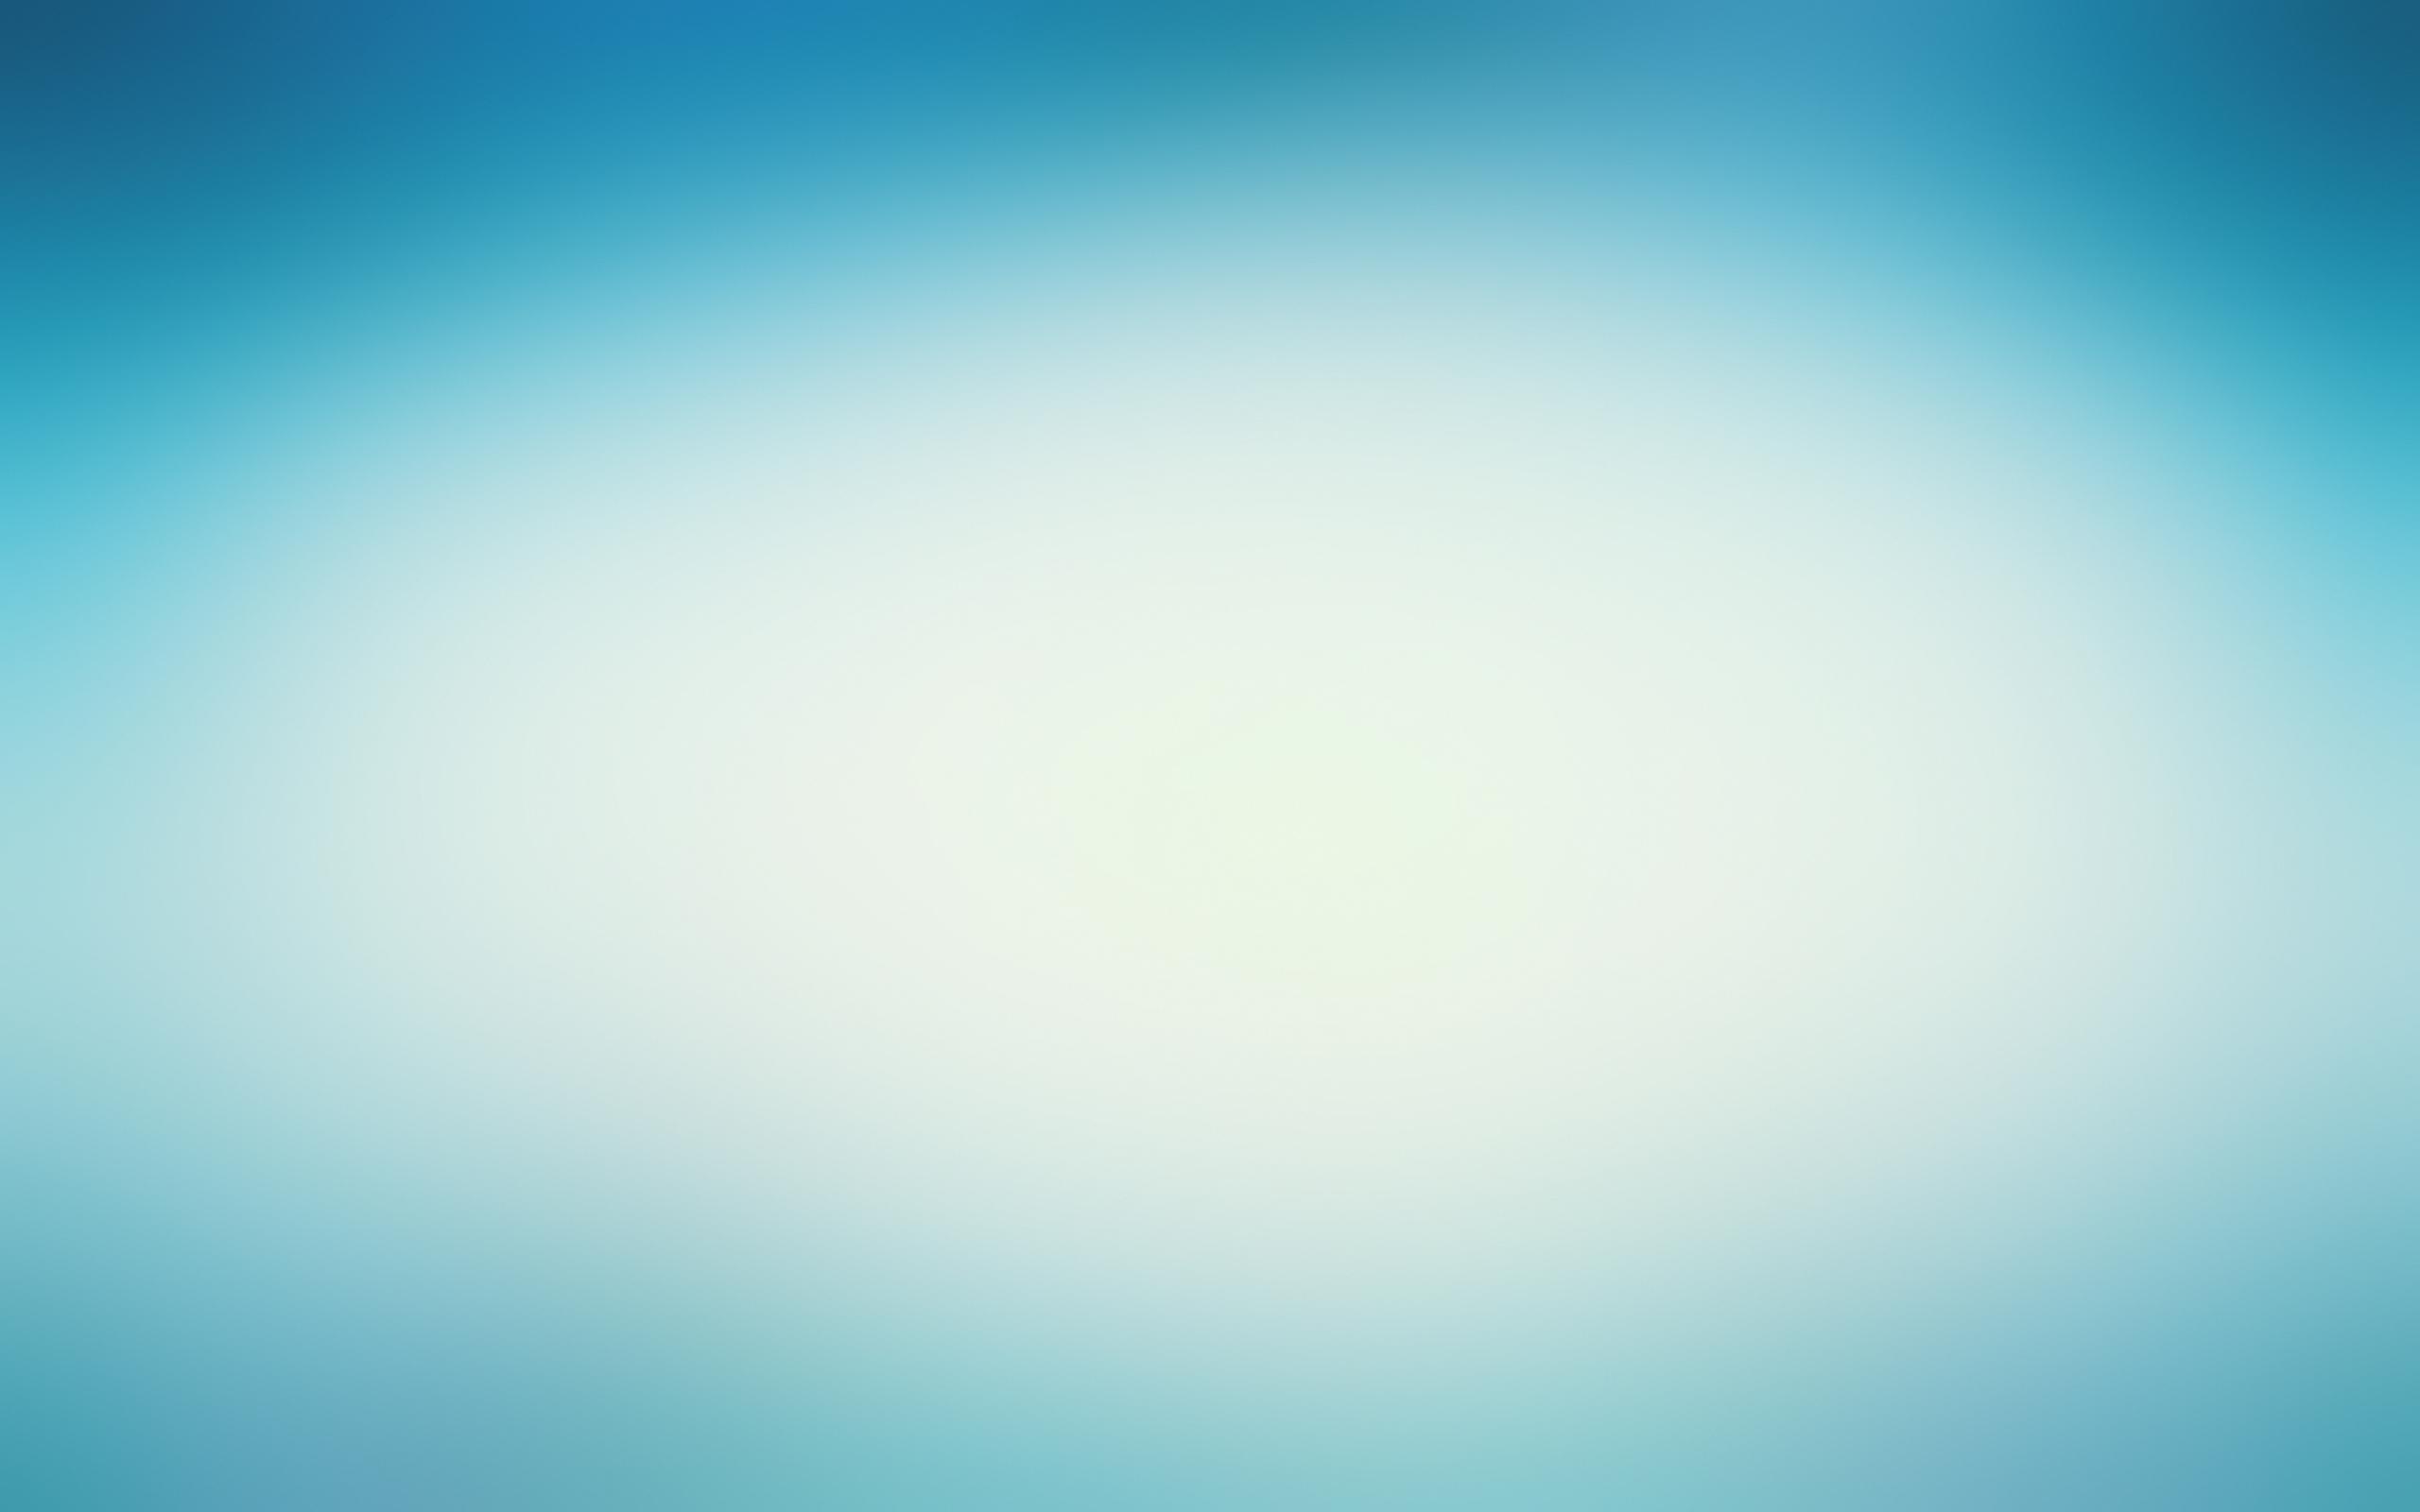 Wallpaper Sky Blue Background Download 2560x1600